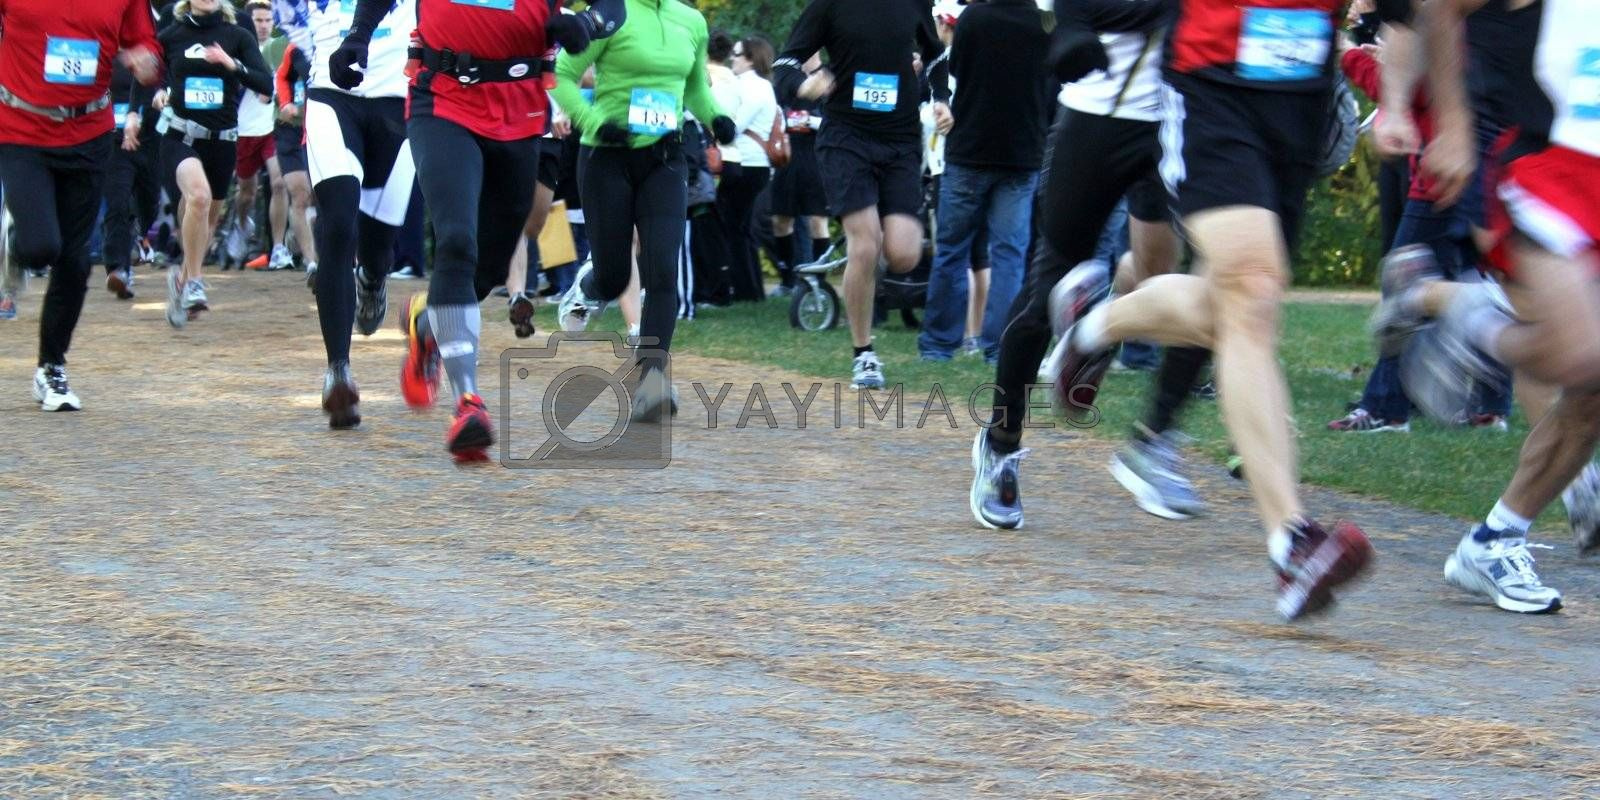 Runners in a charity marathon